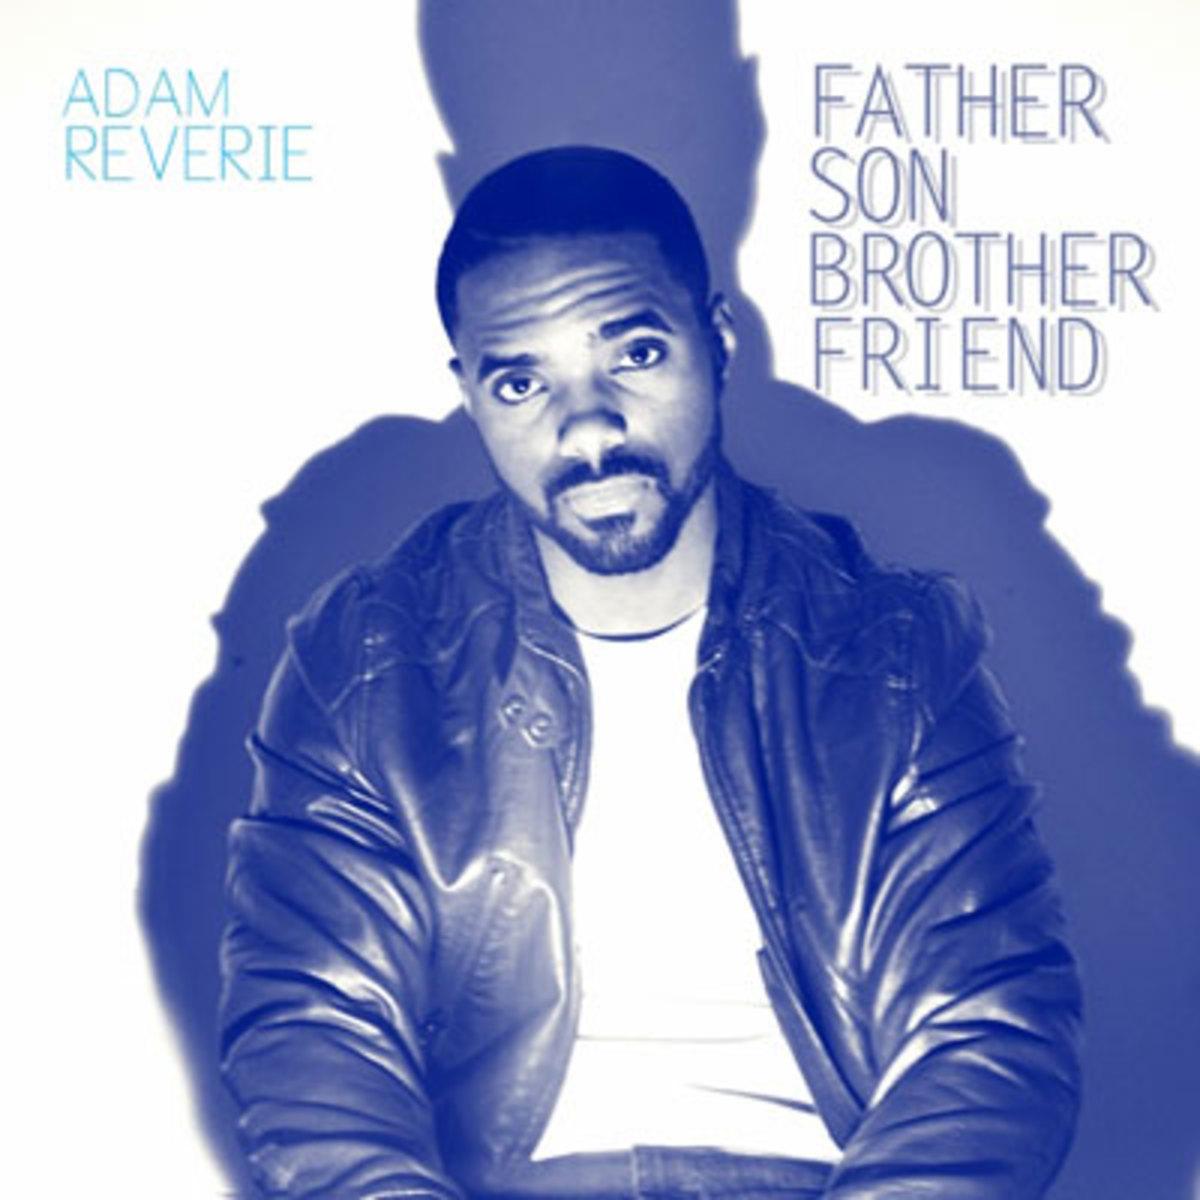 adamreverie-fathersonbrotherfriend.jpg